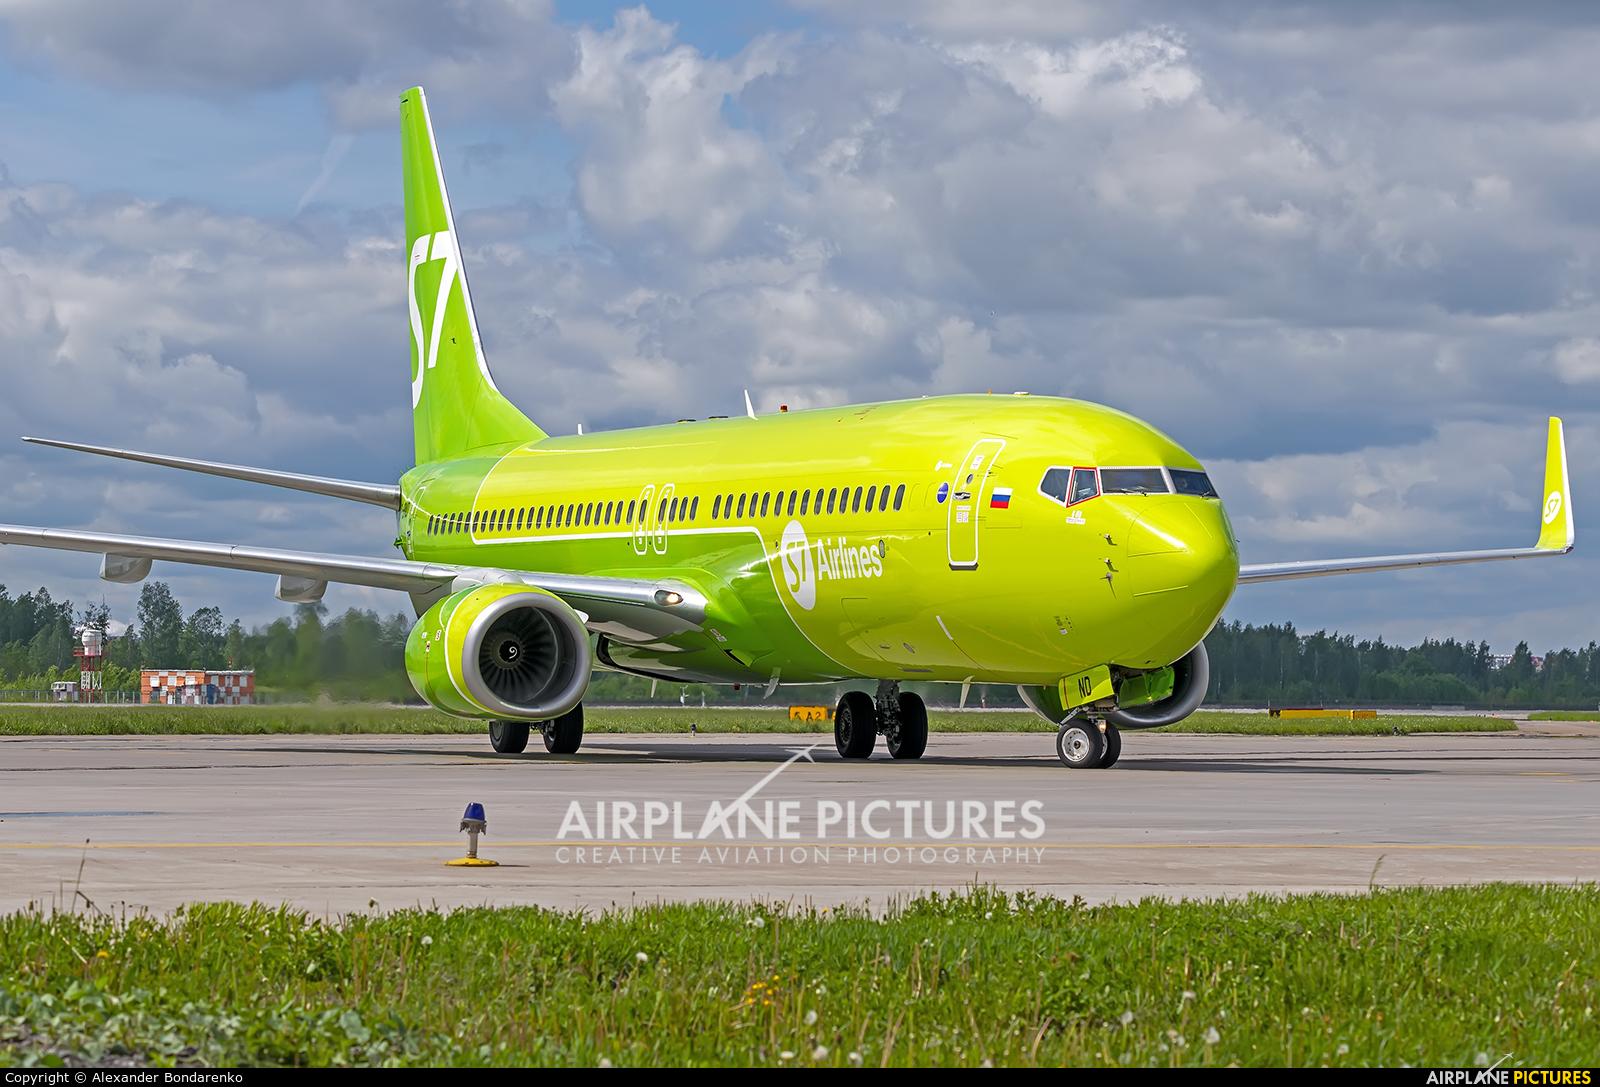 S7 Airlines VP-BND aircraft at St. Petersburg - Pulkovo